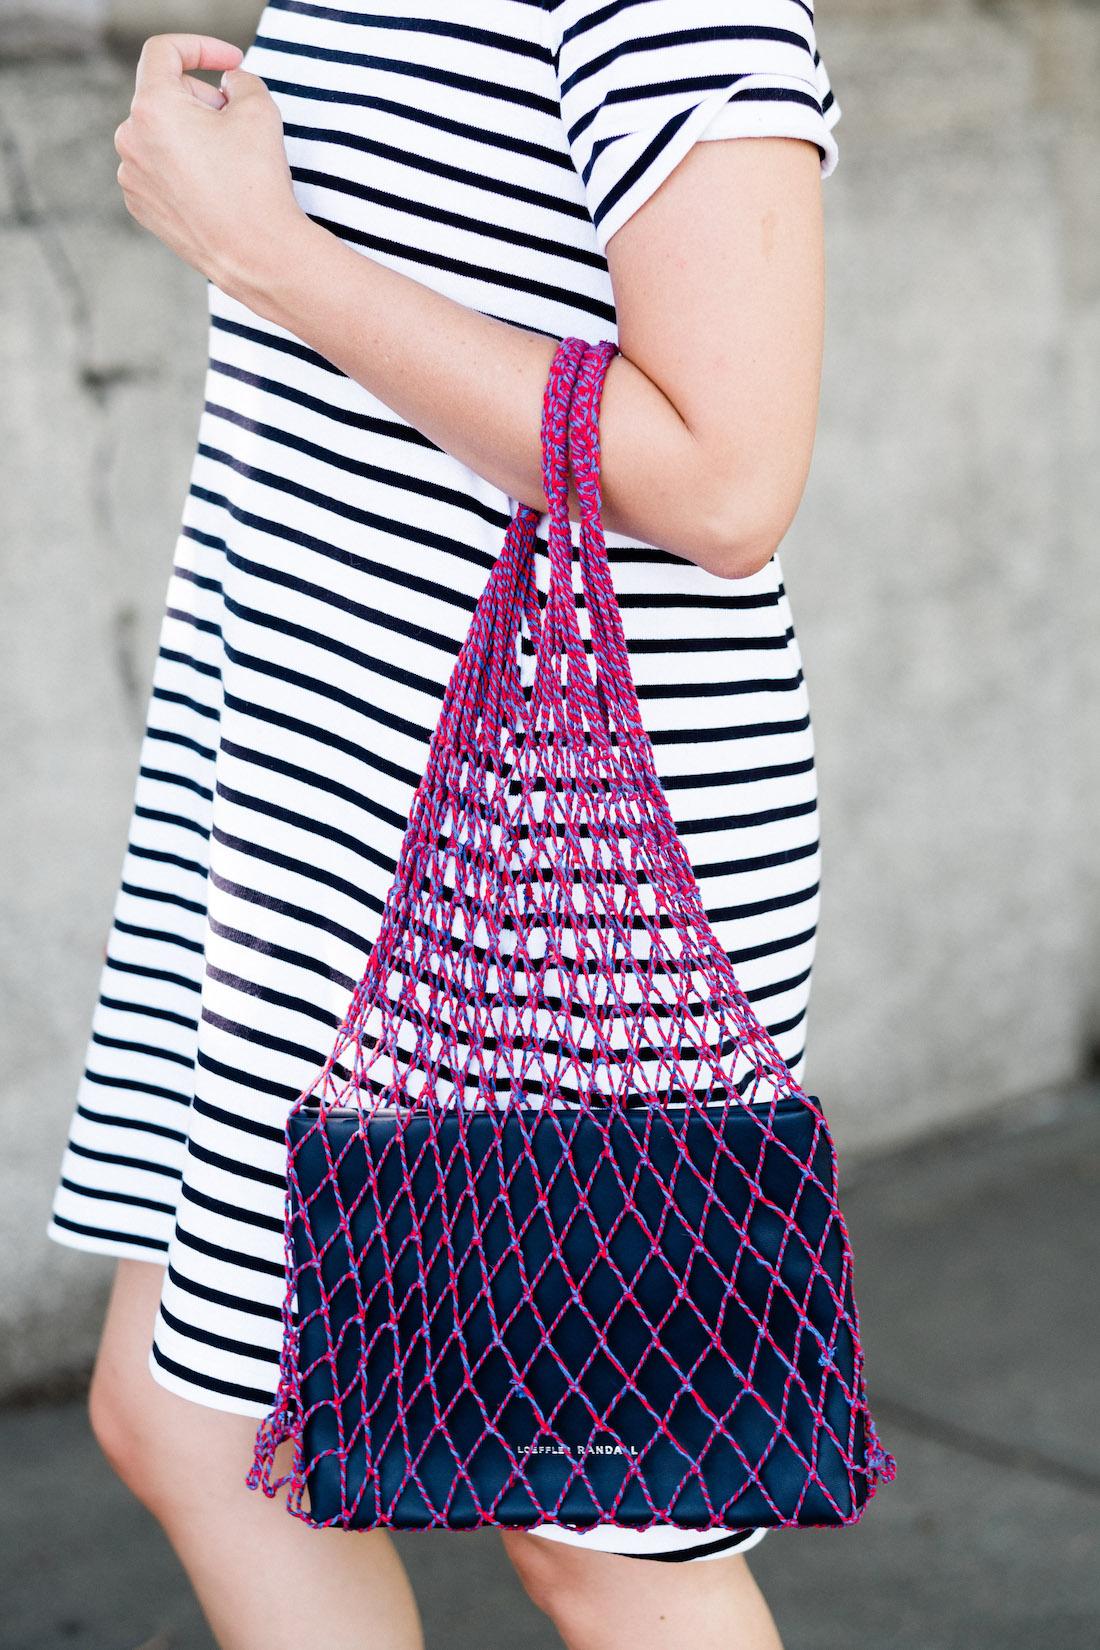 loeffler randall net bag with sacai stripe t-shirt dress